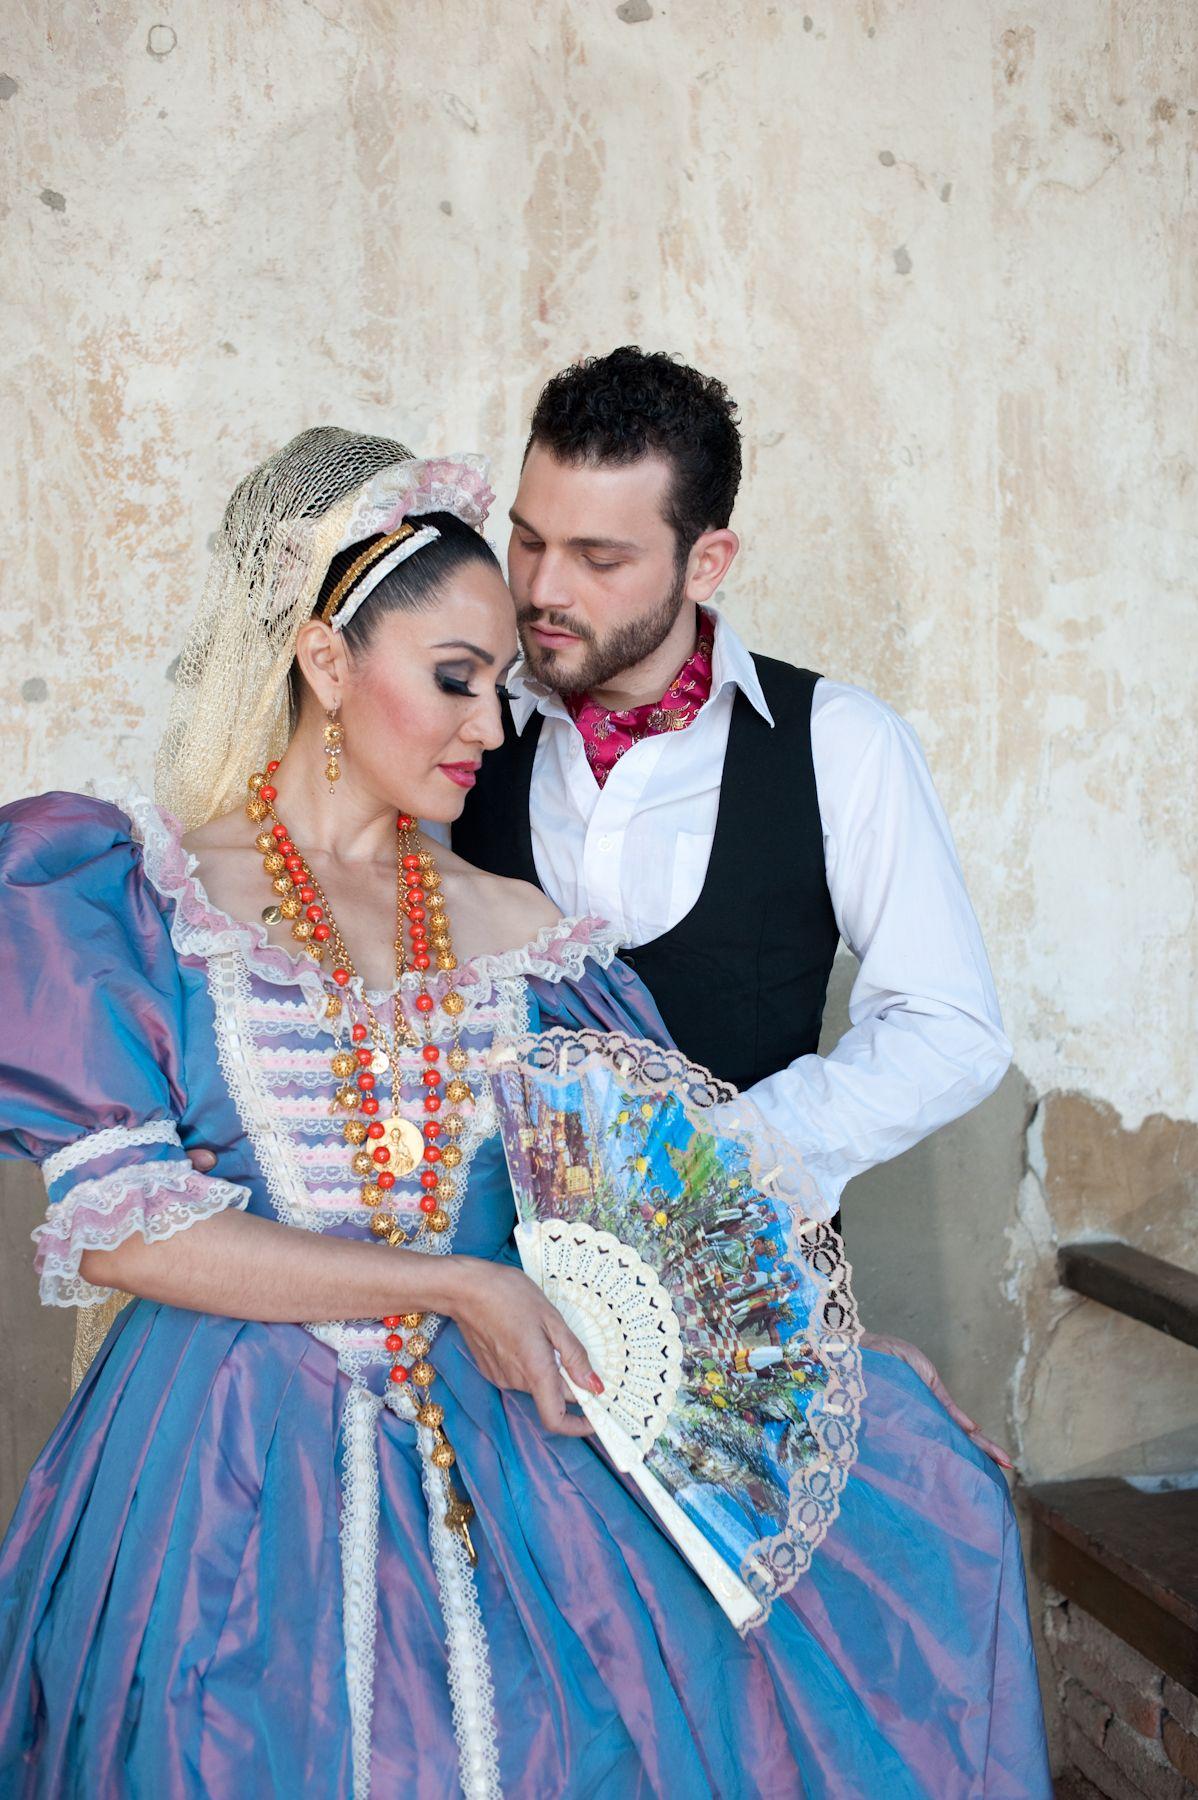 Homepage Ballet Folklorico Leyenda Ballet Folklorico Mexican Culture Spanish Dancer